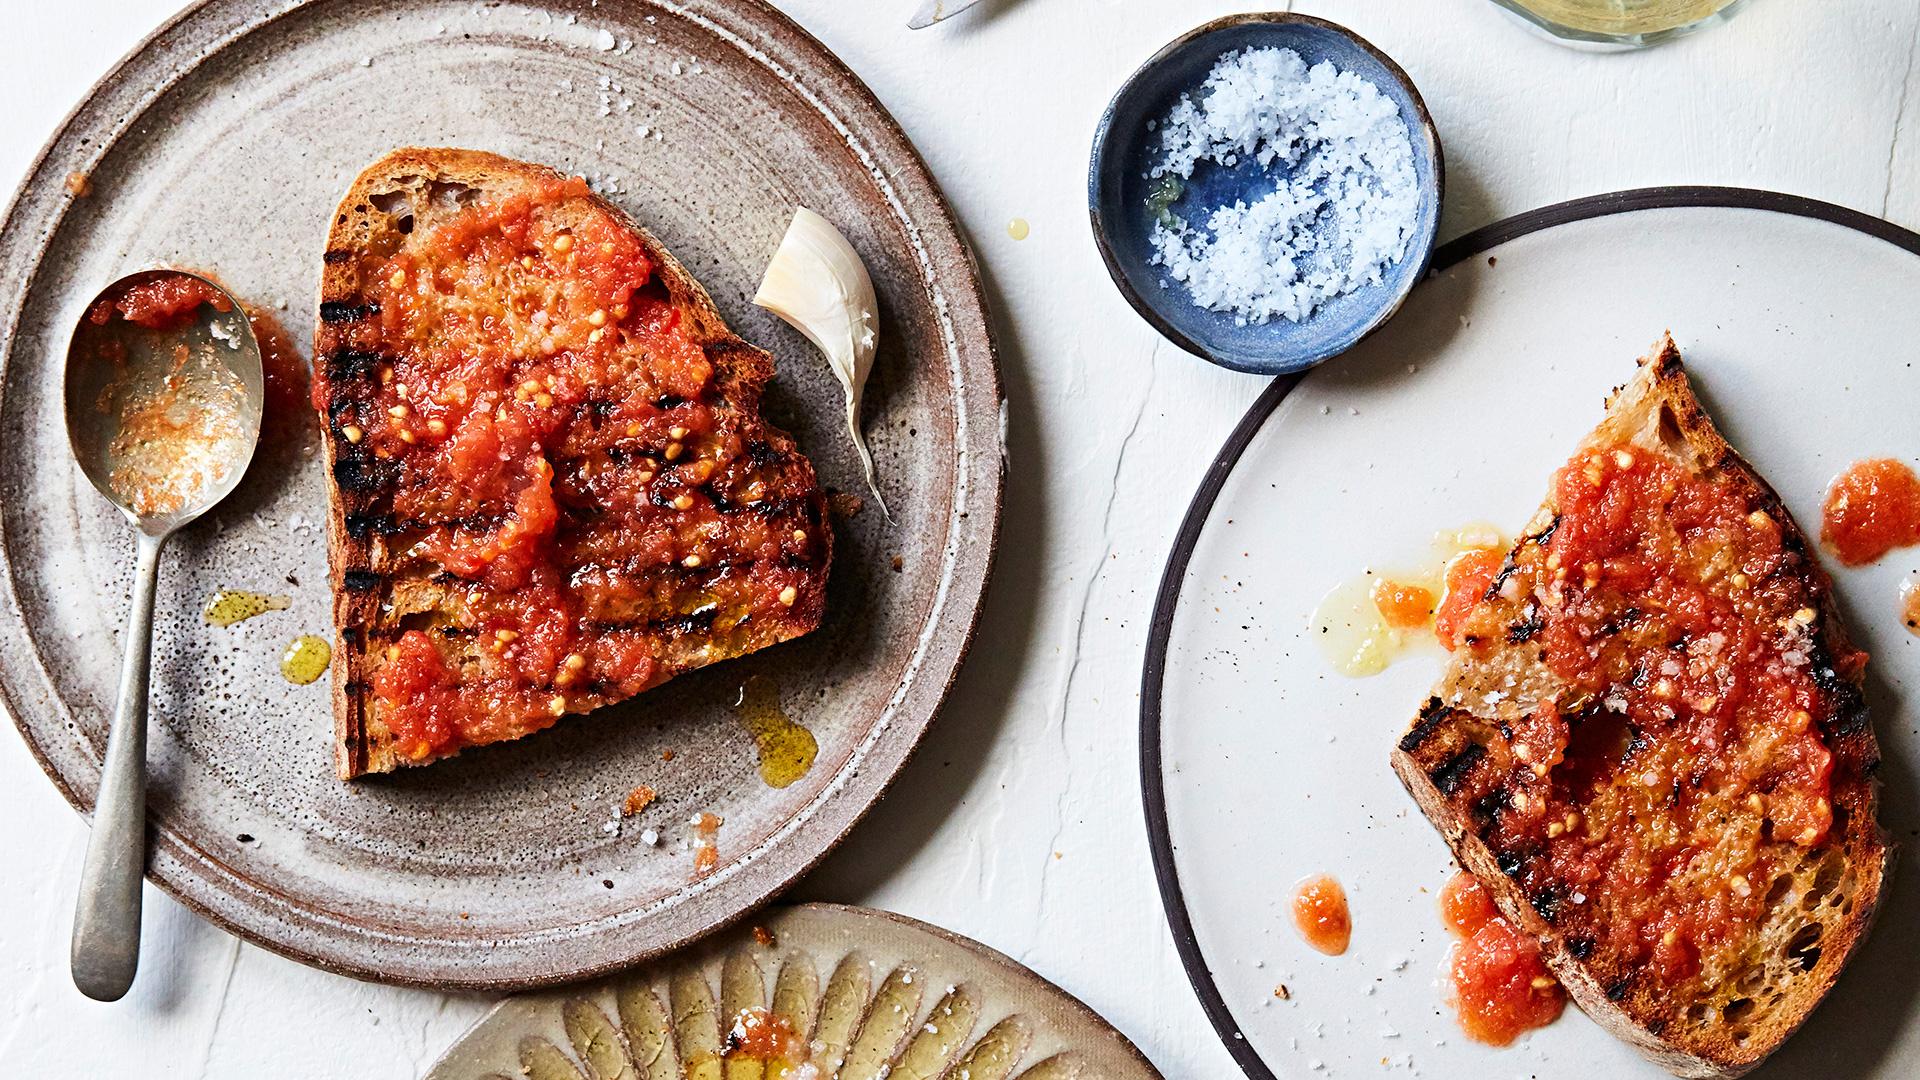 Raul Diaz's pan con tomate